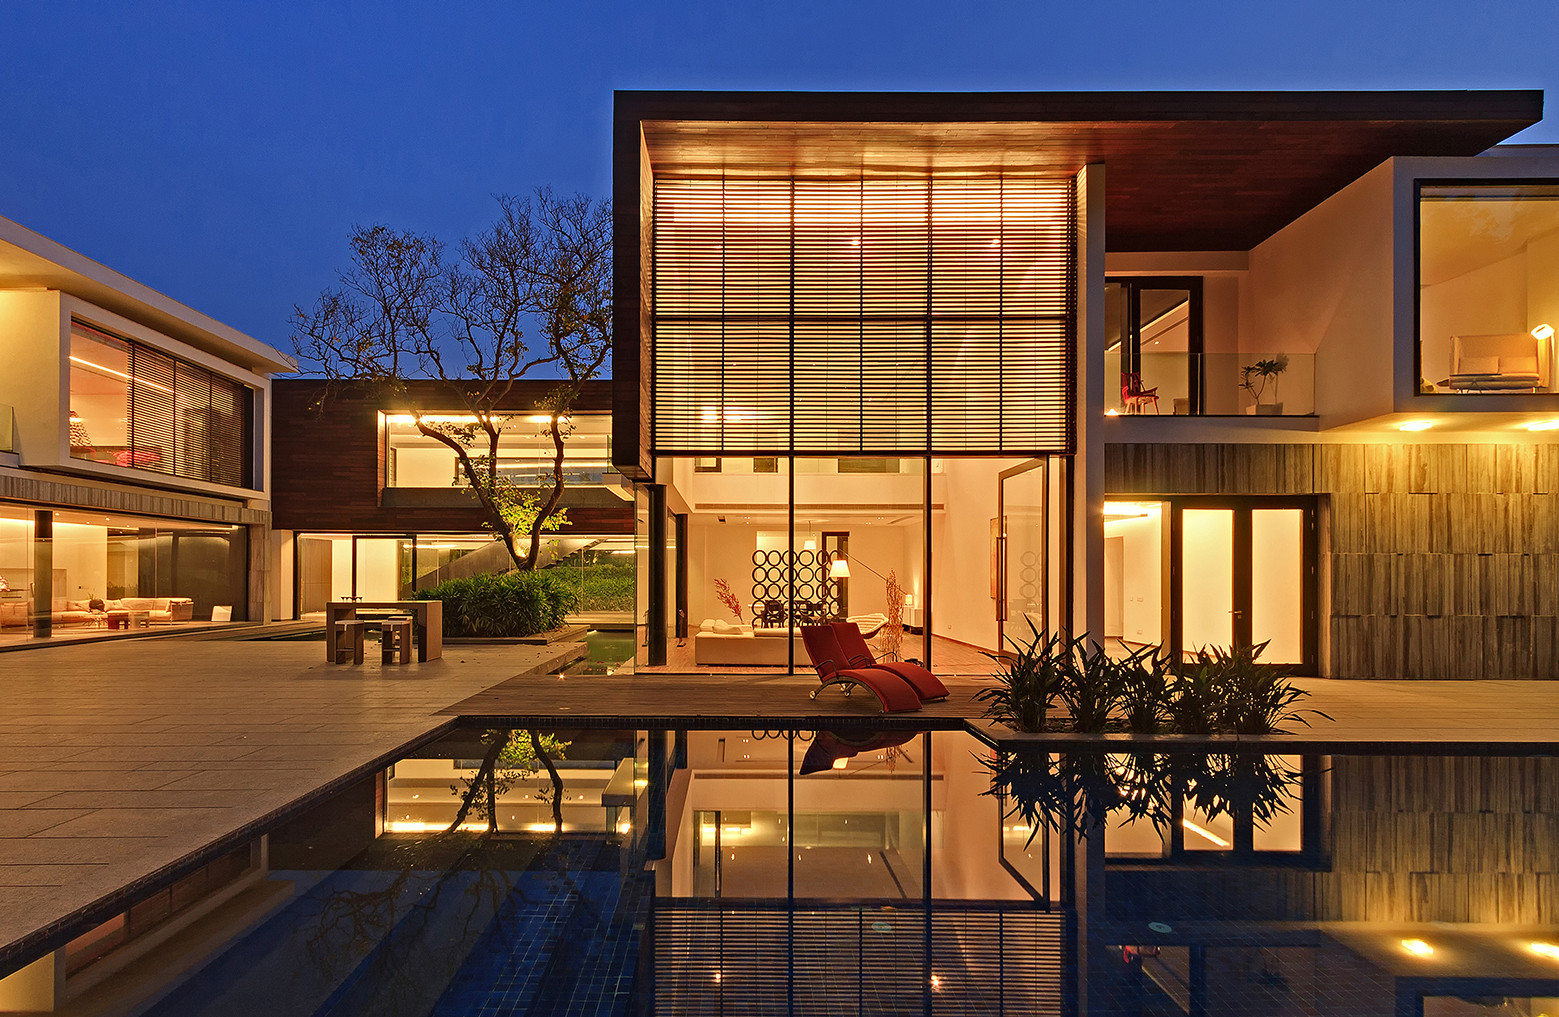 Galer a de la casa de los tres rboles dada partners 9 for Maison de design arkitek